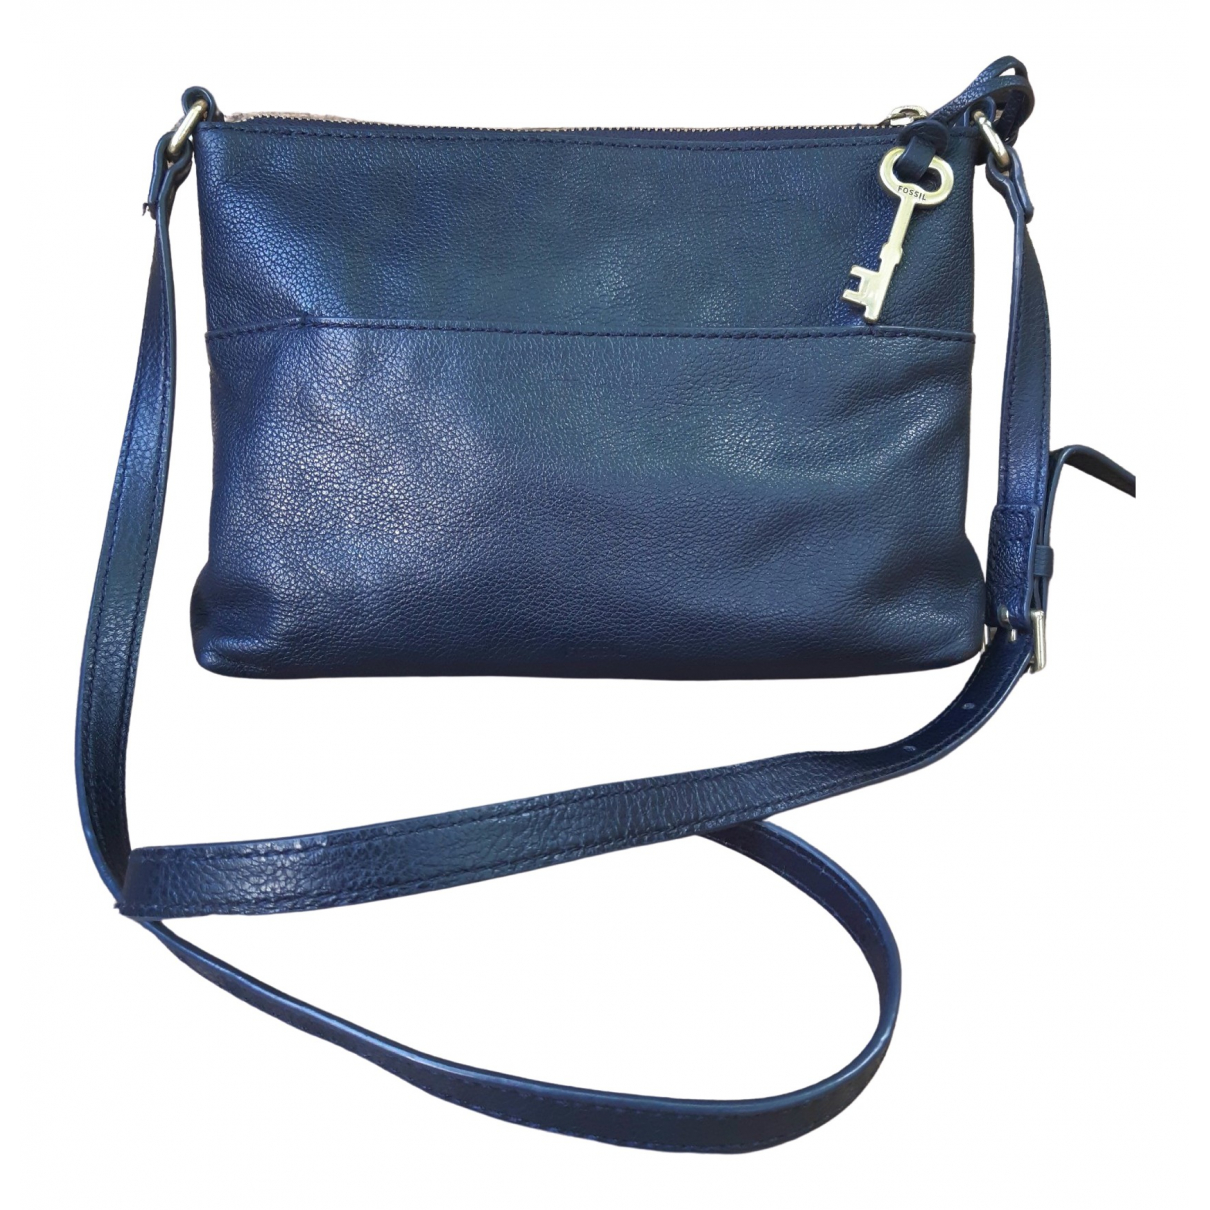 Fossil \N Black Leather handbag for Women \N